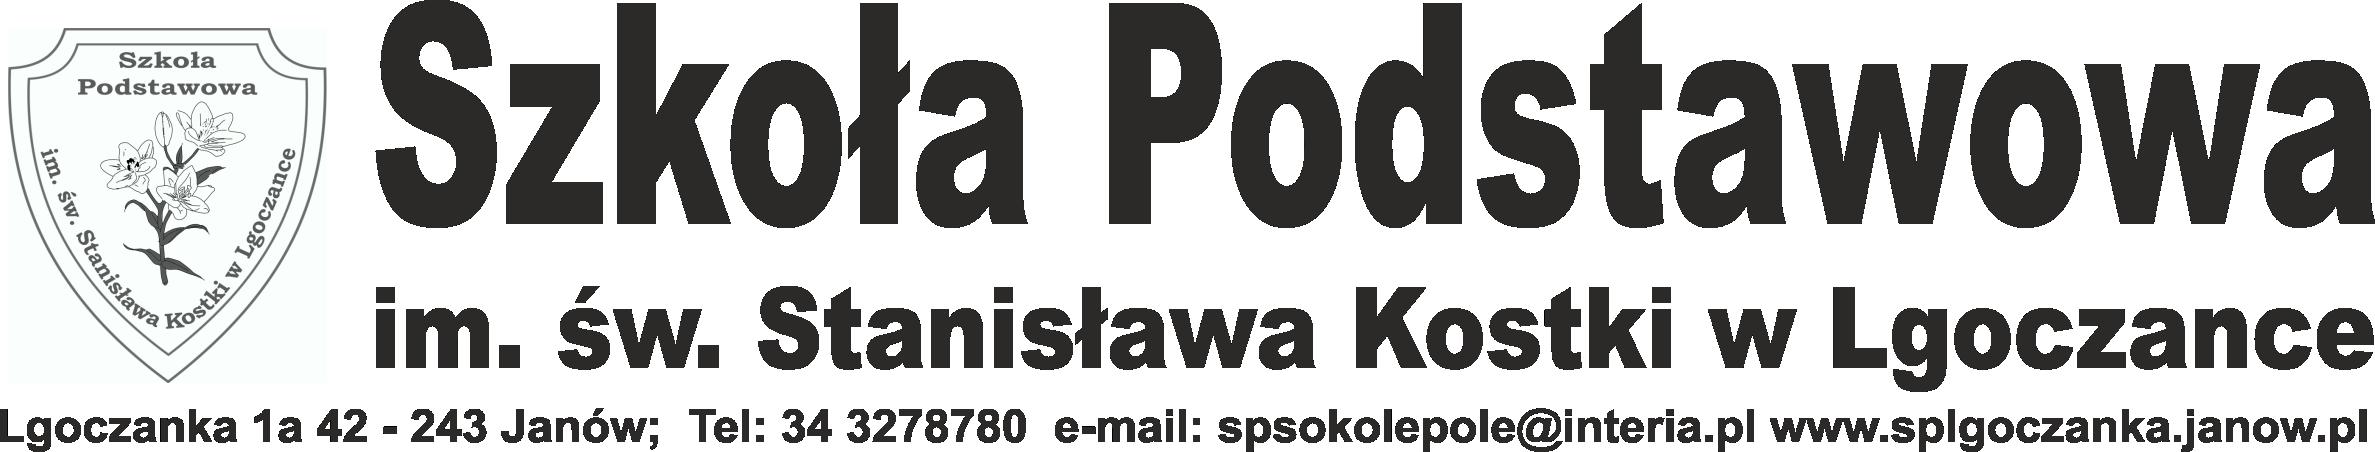 splgoczanka_zaloba.png